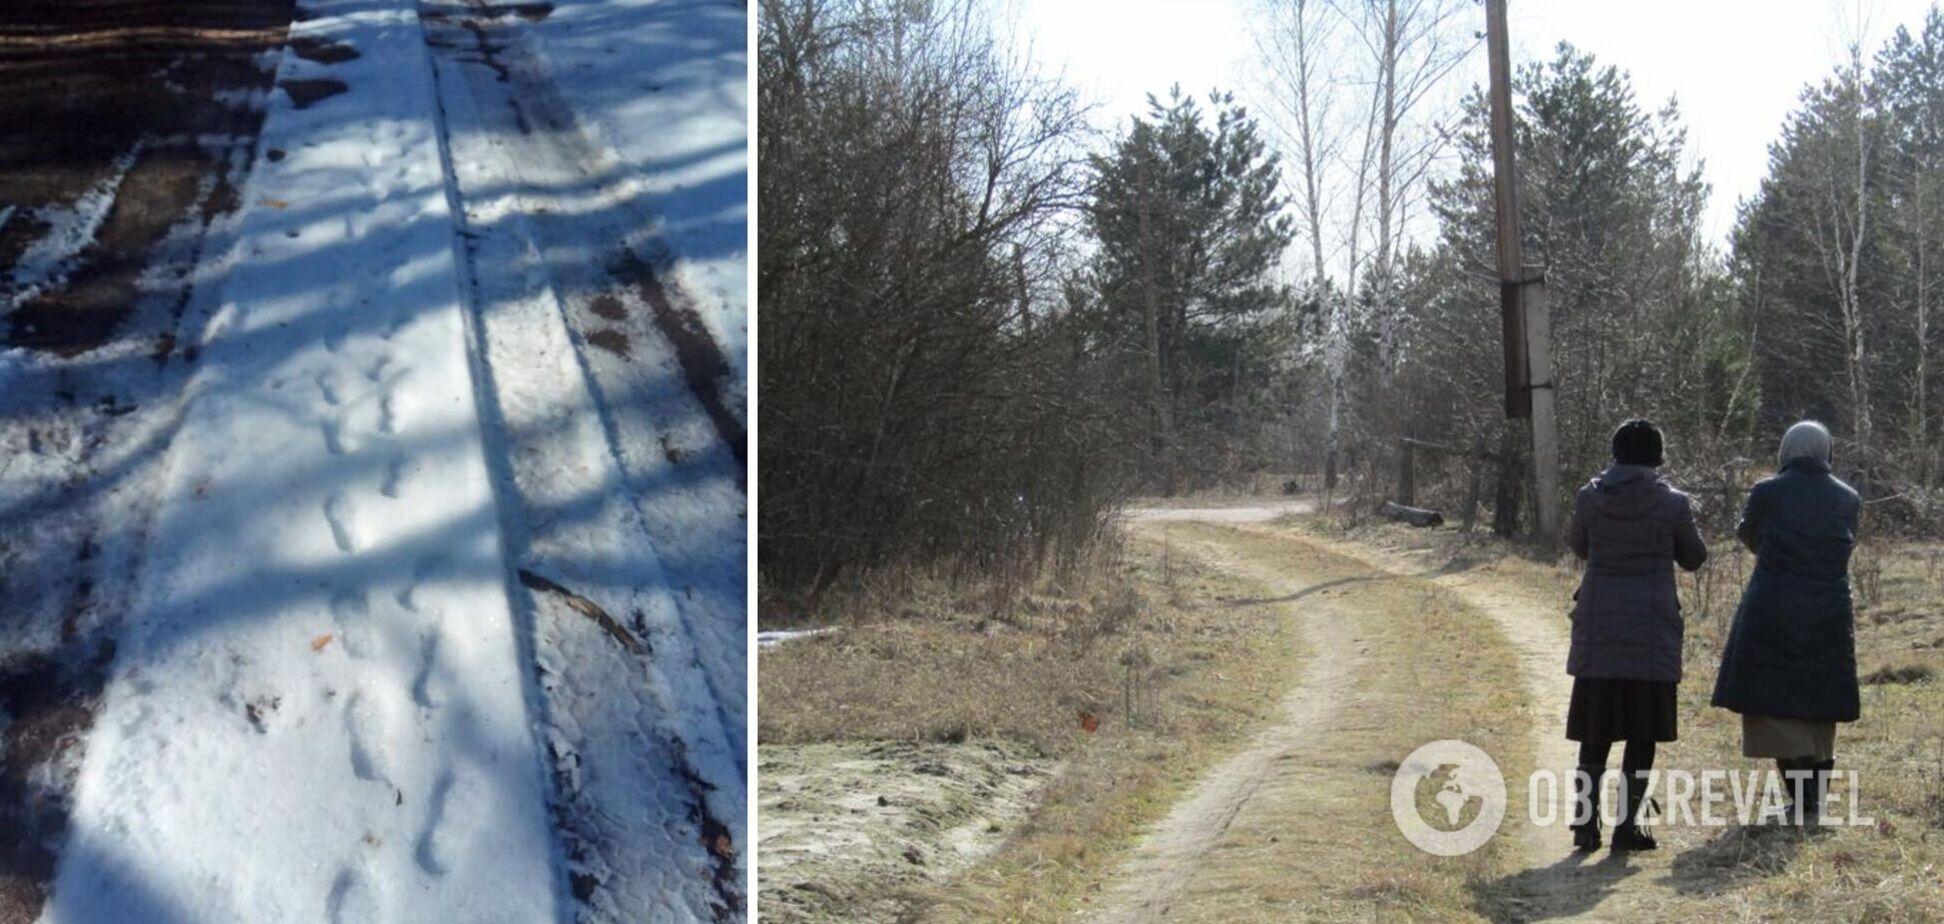 На Житомирщине 2-летний ребенок сам ушел в лес: его нашли по следам на снегу. Фото и видео